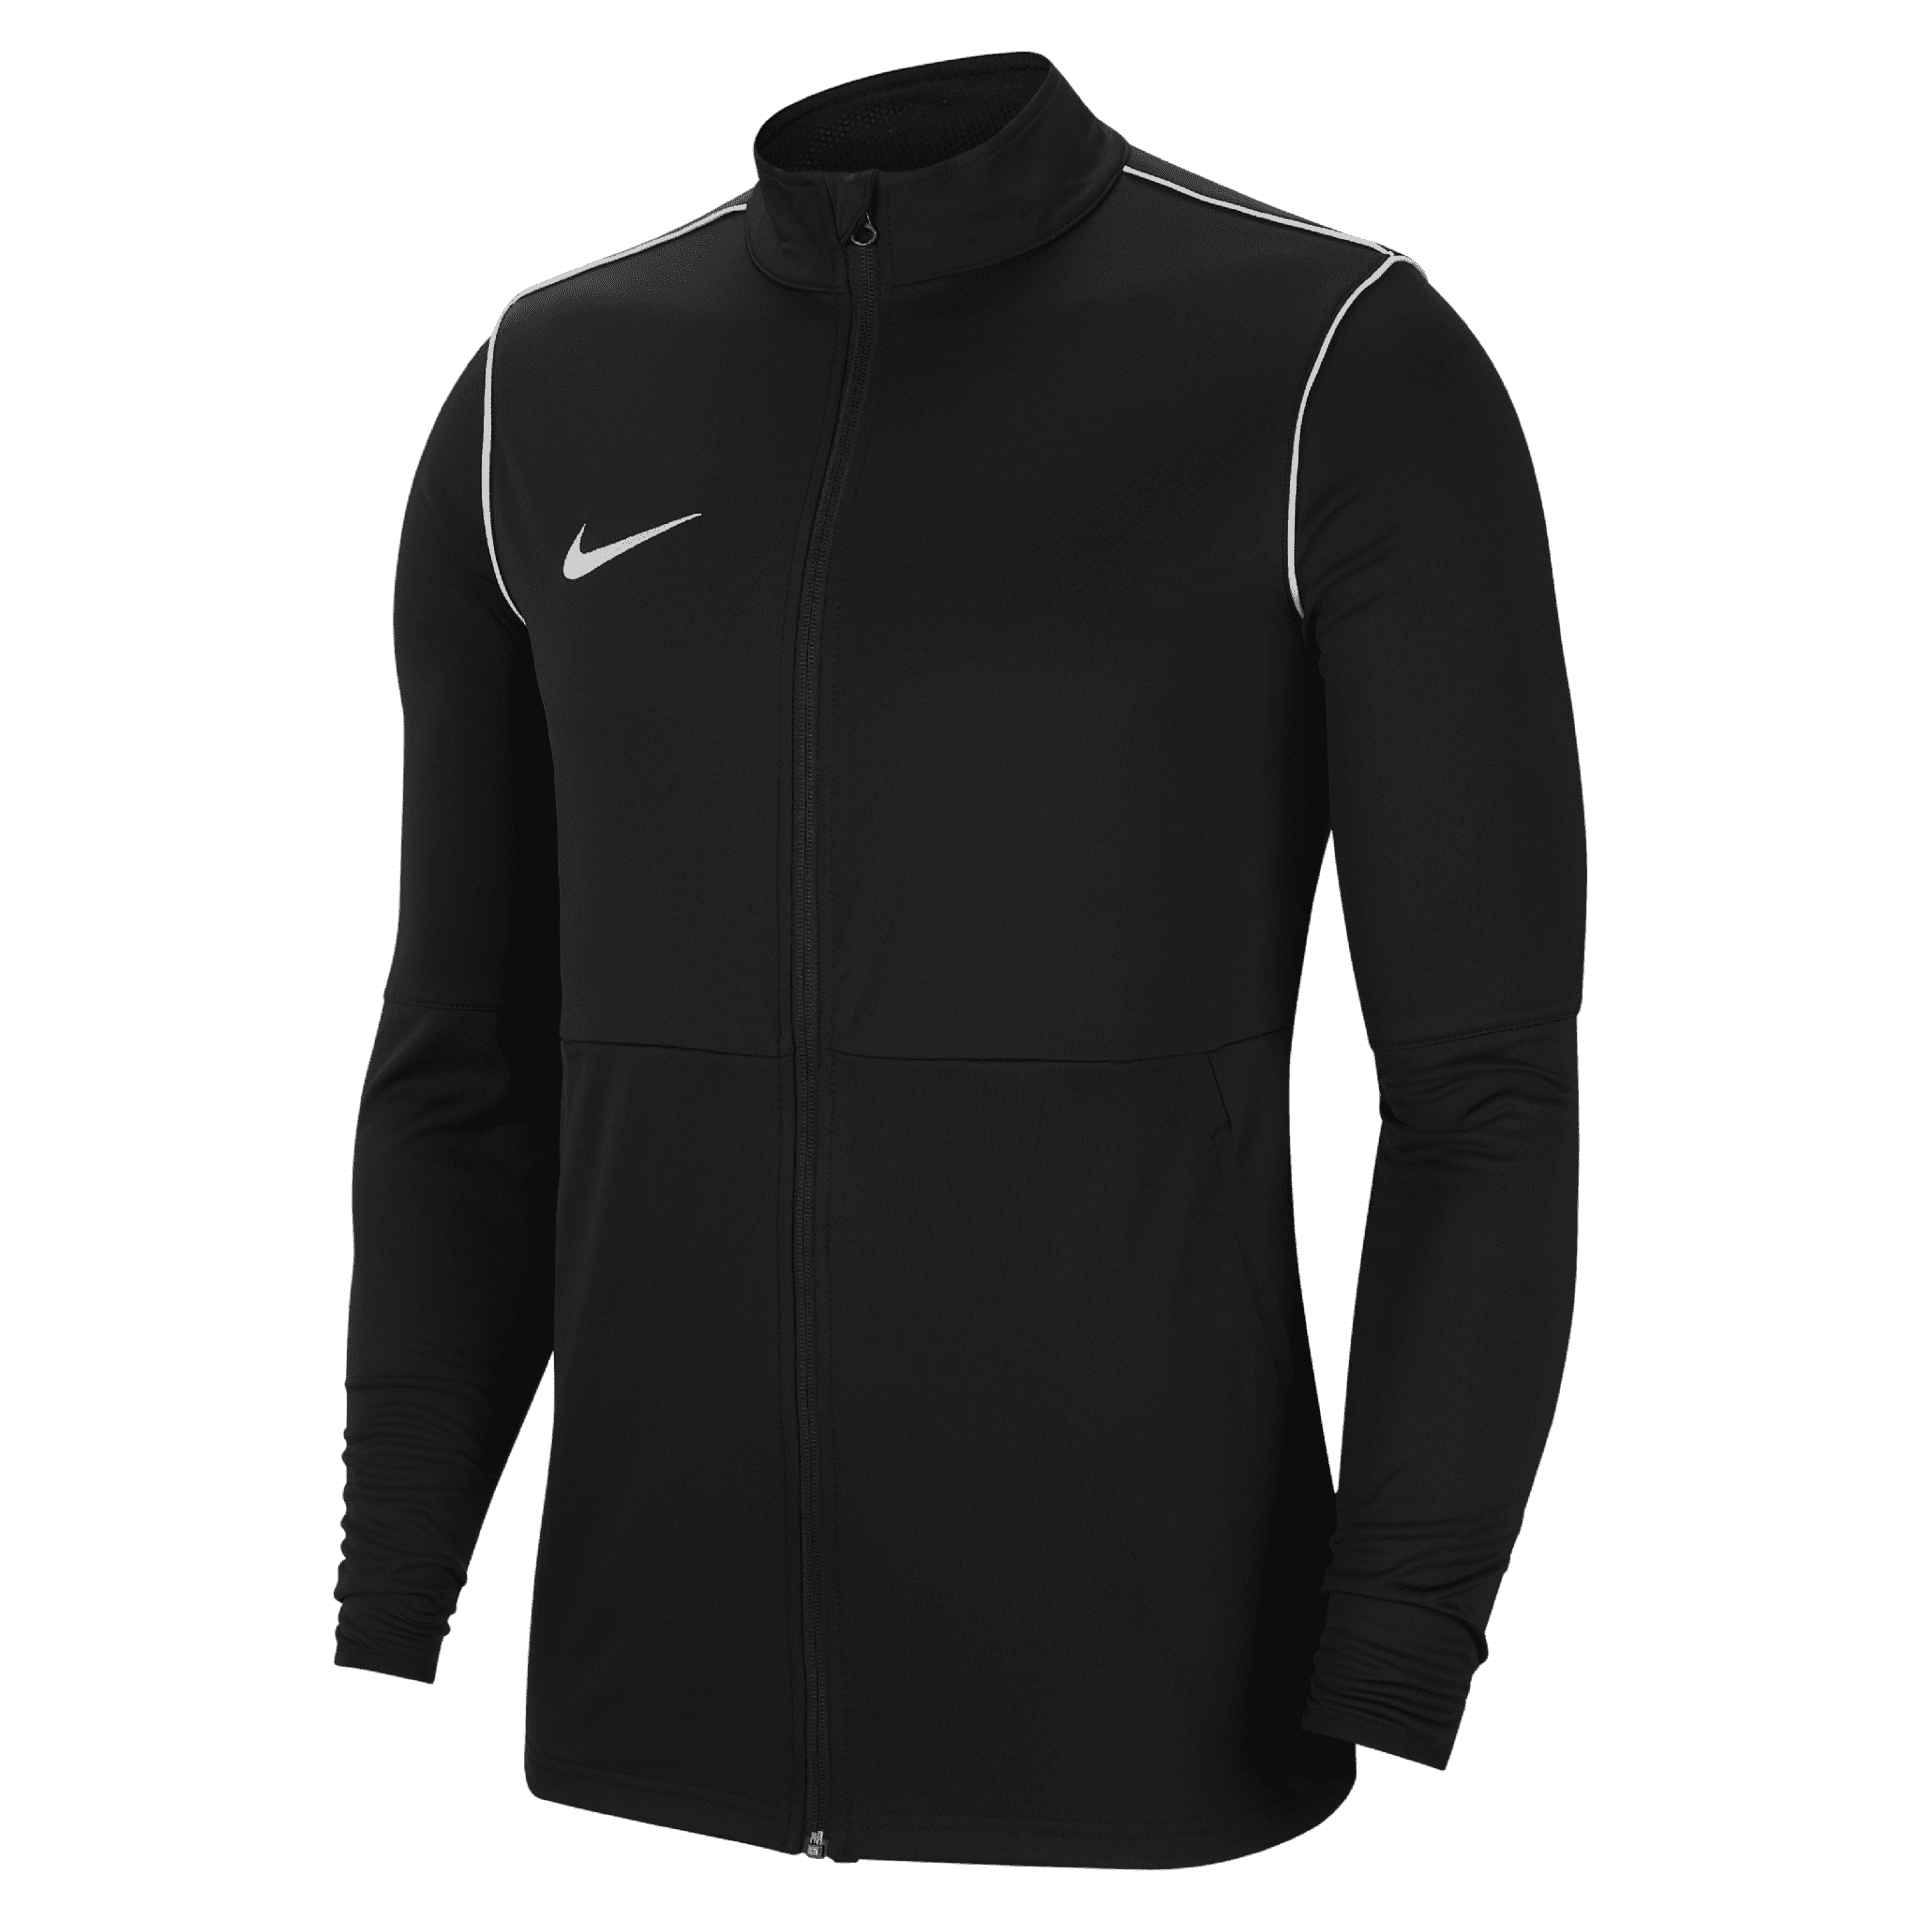 nike park 20 knit track jacket size xxl mens  4  28625 p